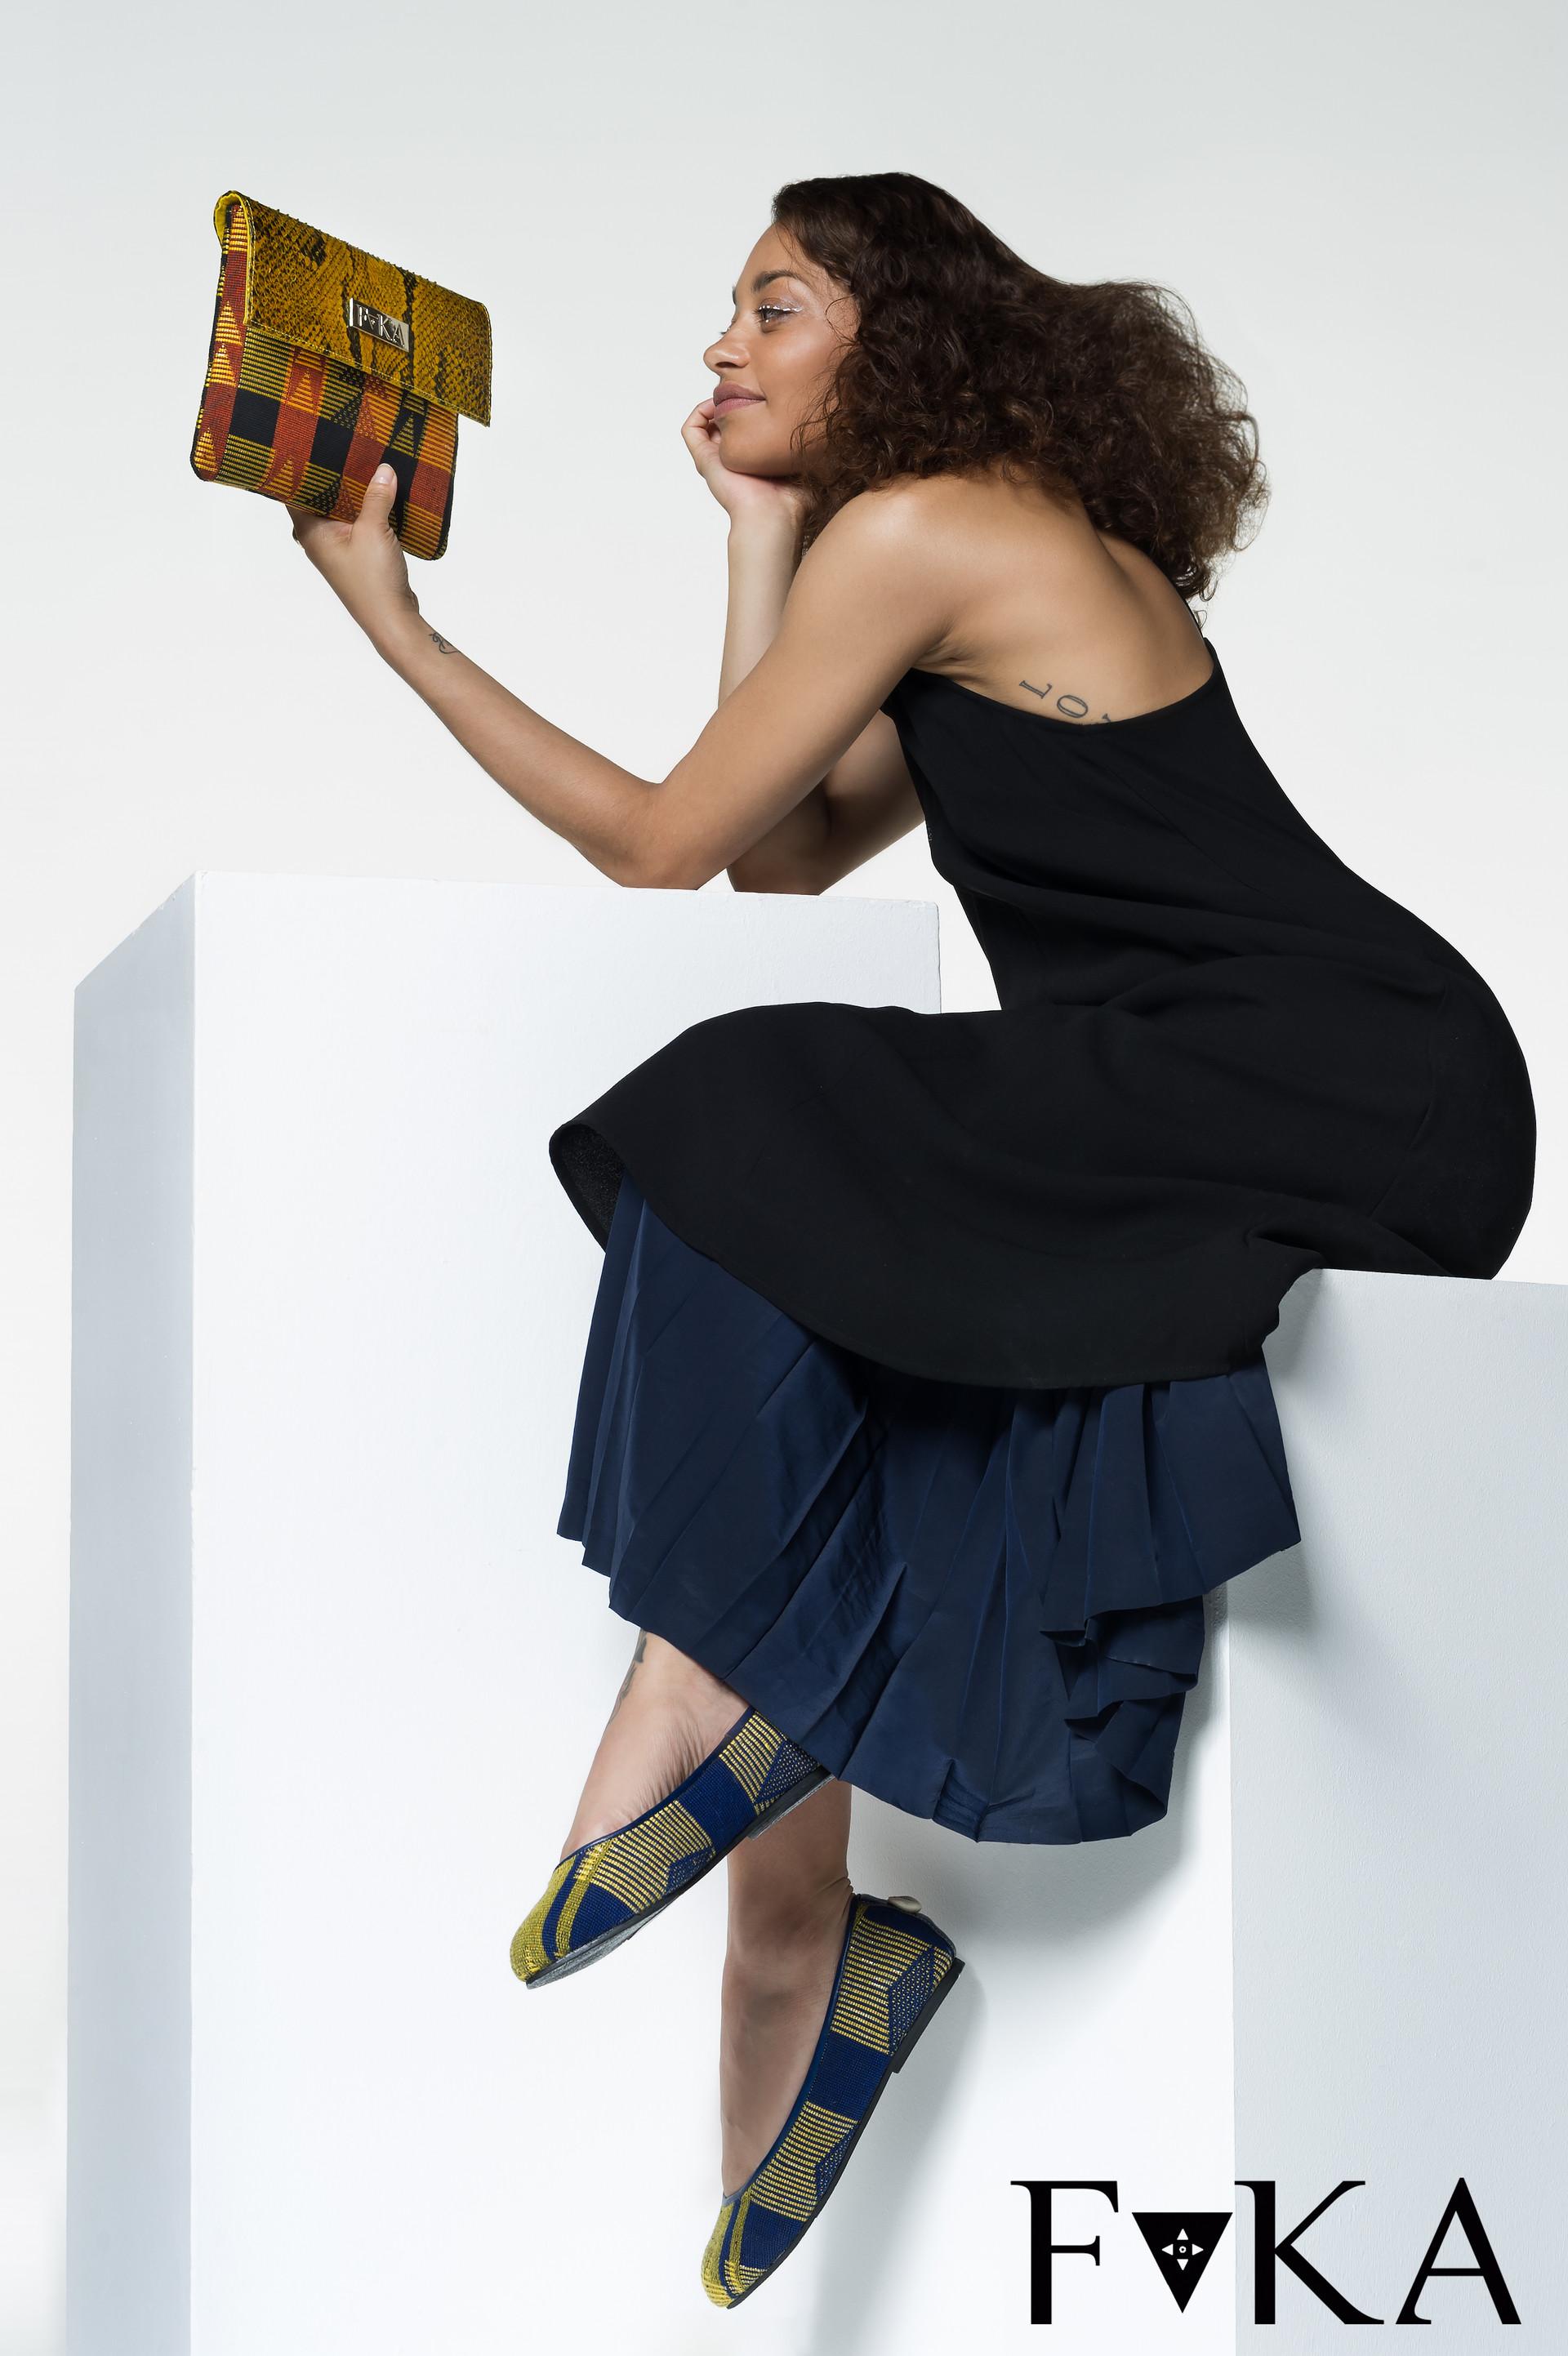 Photographer Choi David Model Zelda Hair/ make-up Rhian Webster